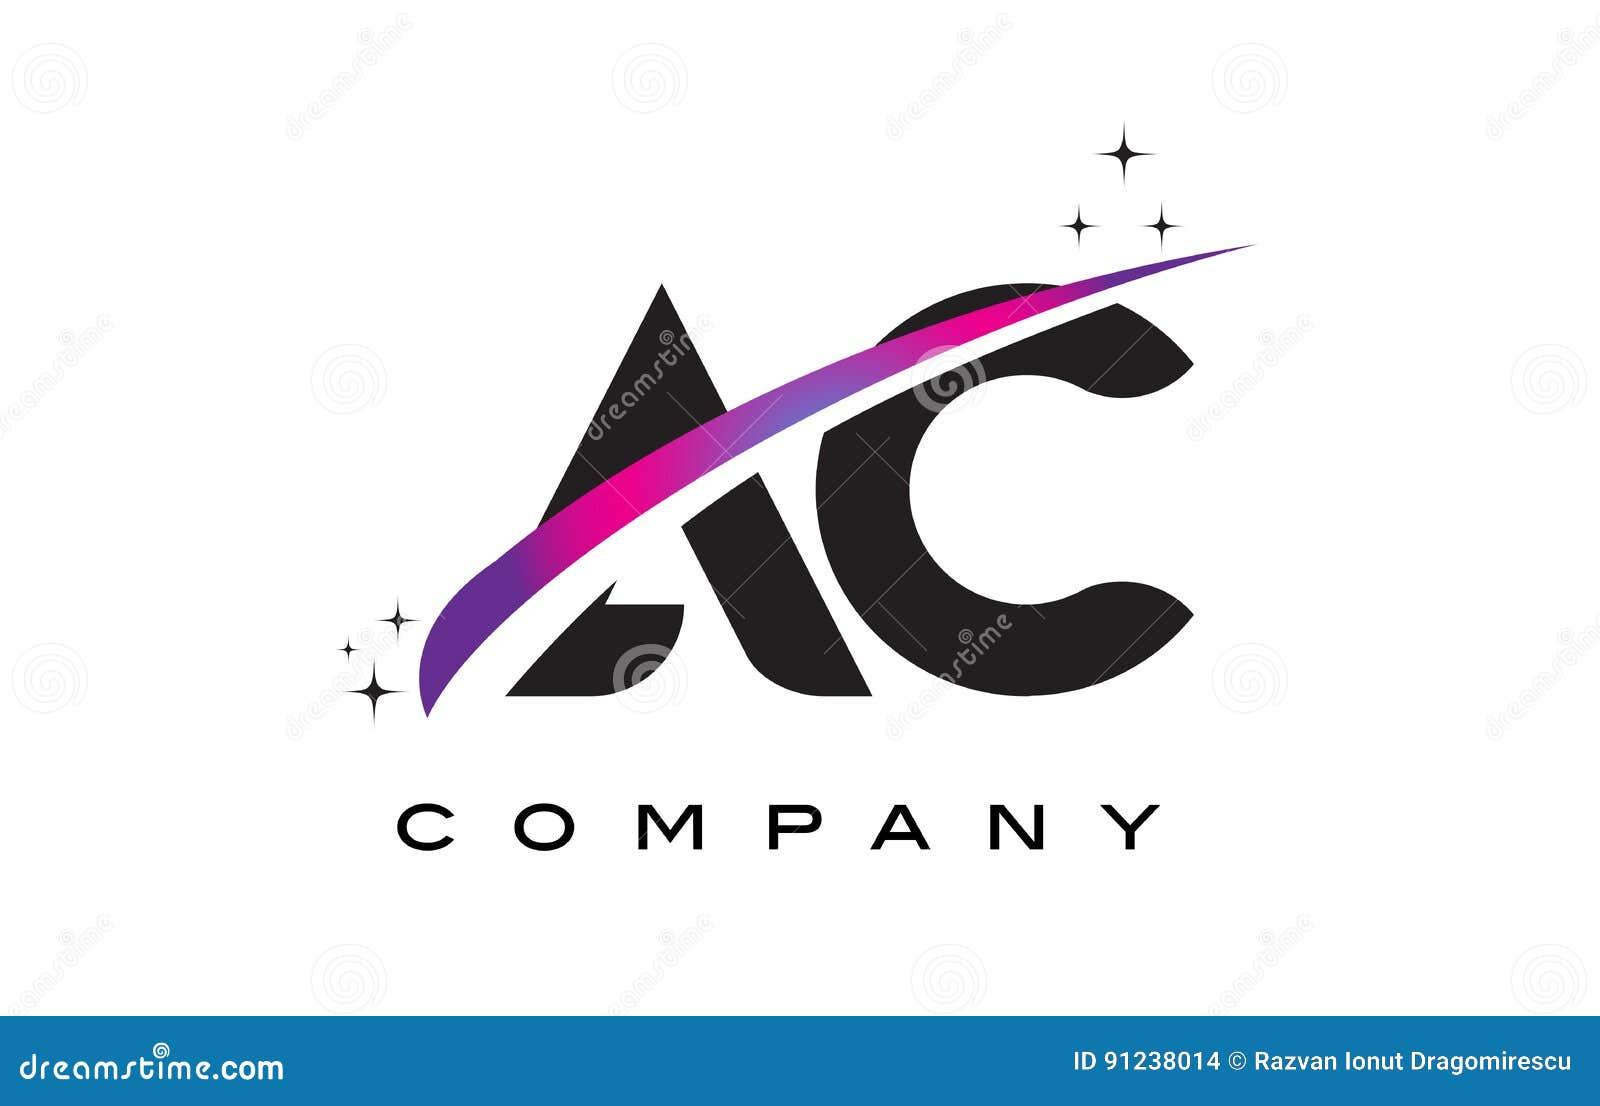 ac a c black letter logo design with purple magenta swoosh stock vector image 91238014. Black Bedroom Furniture Sets. Home Design Ideas